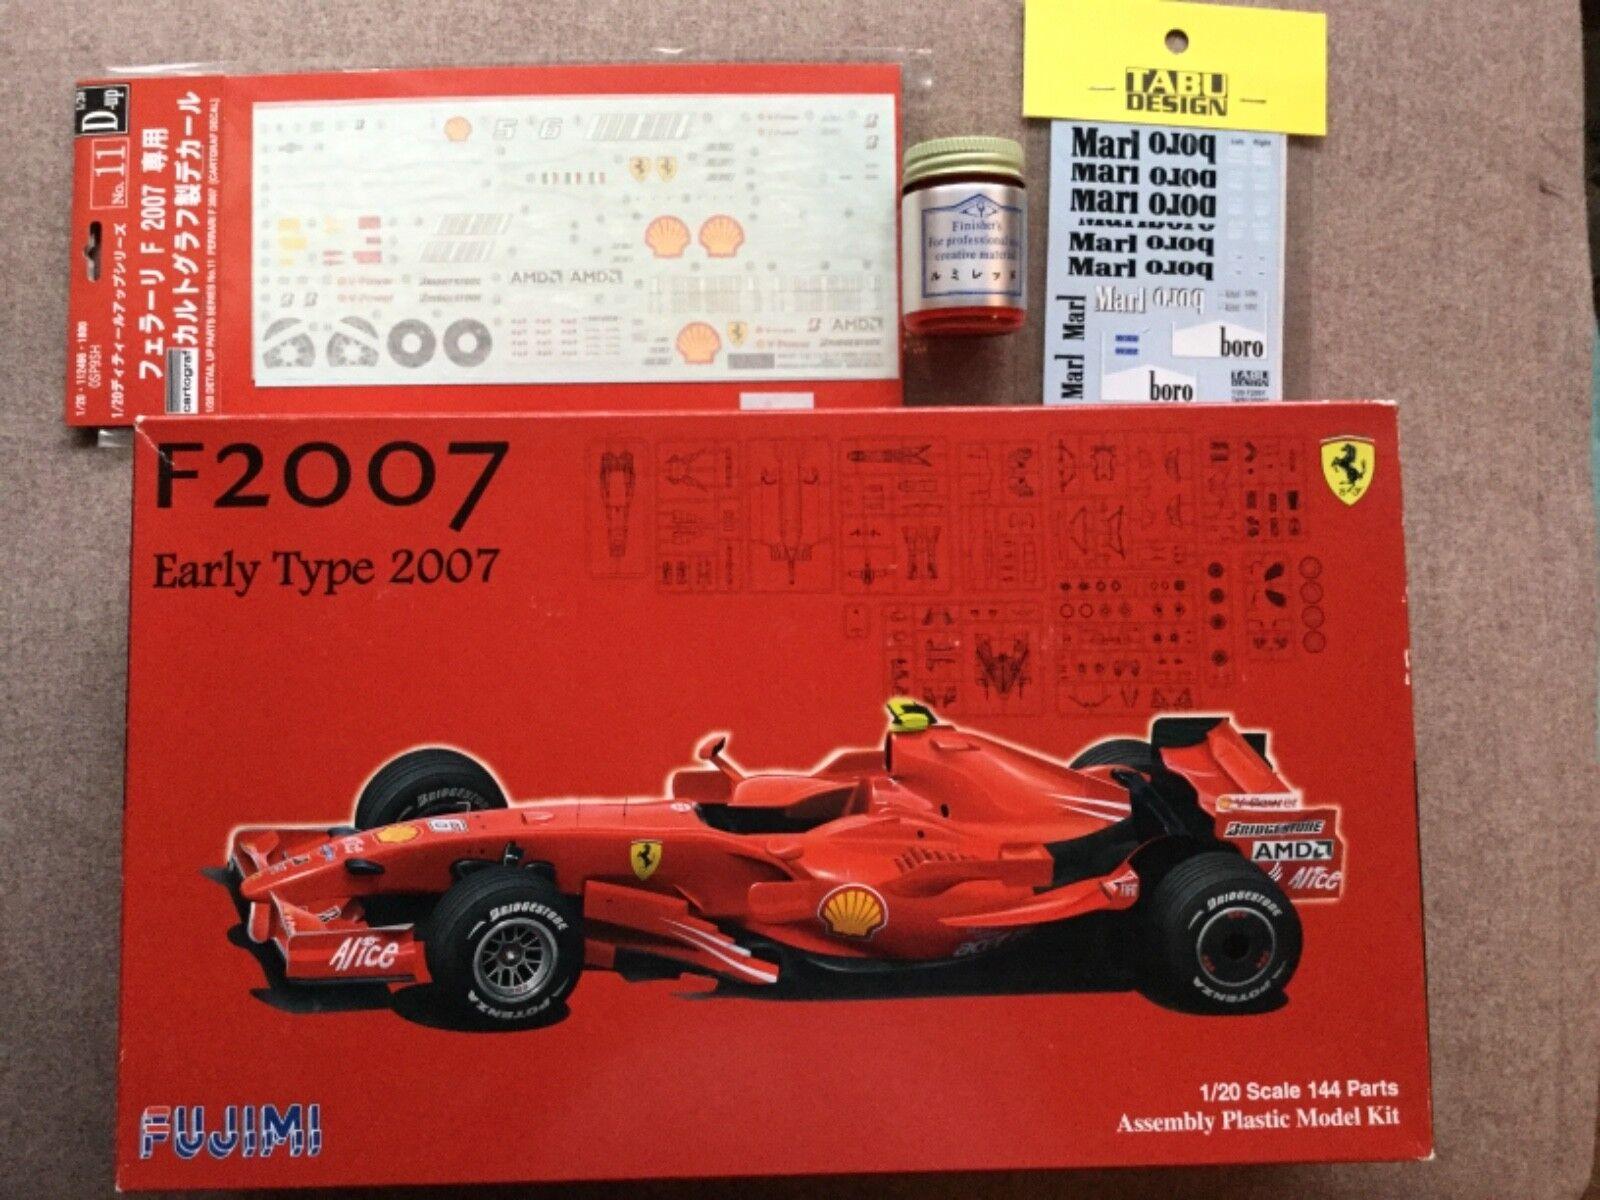 1 20 Fujimi Ferrari F2007, Fujimi upgrade decal,Tabu tobacco decals, match paint